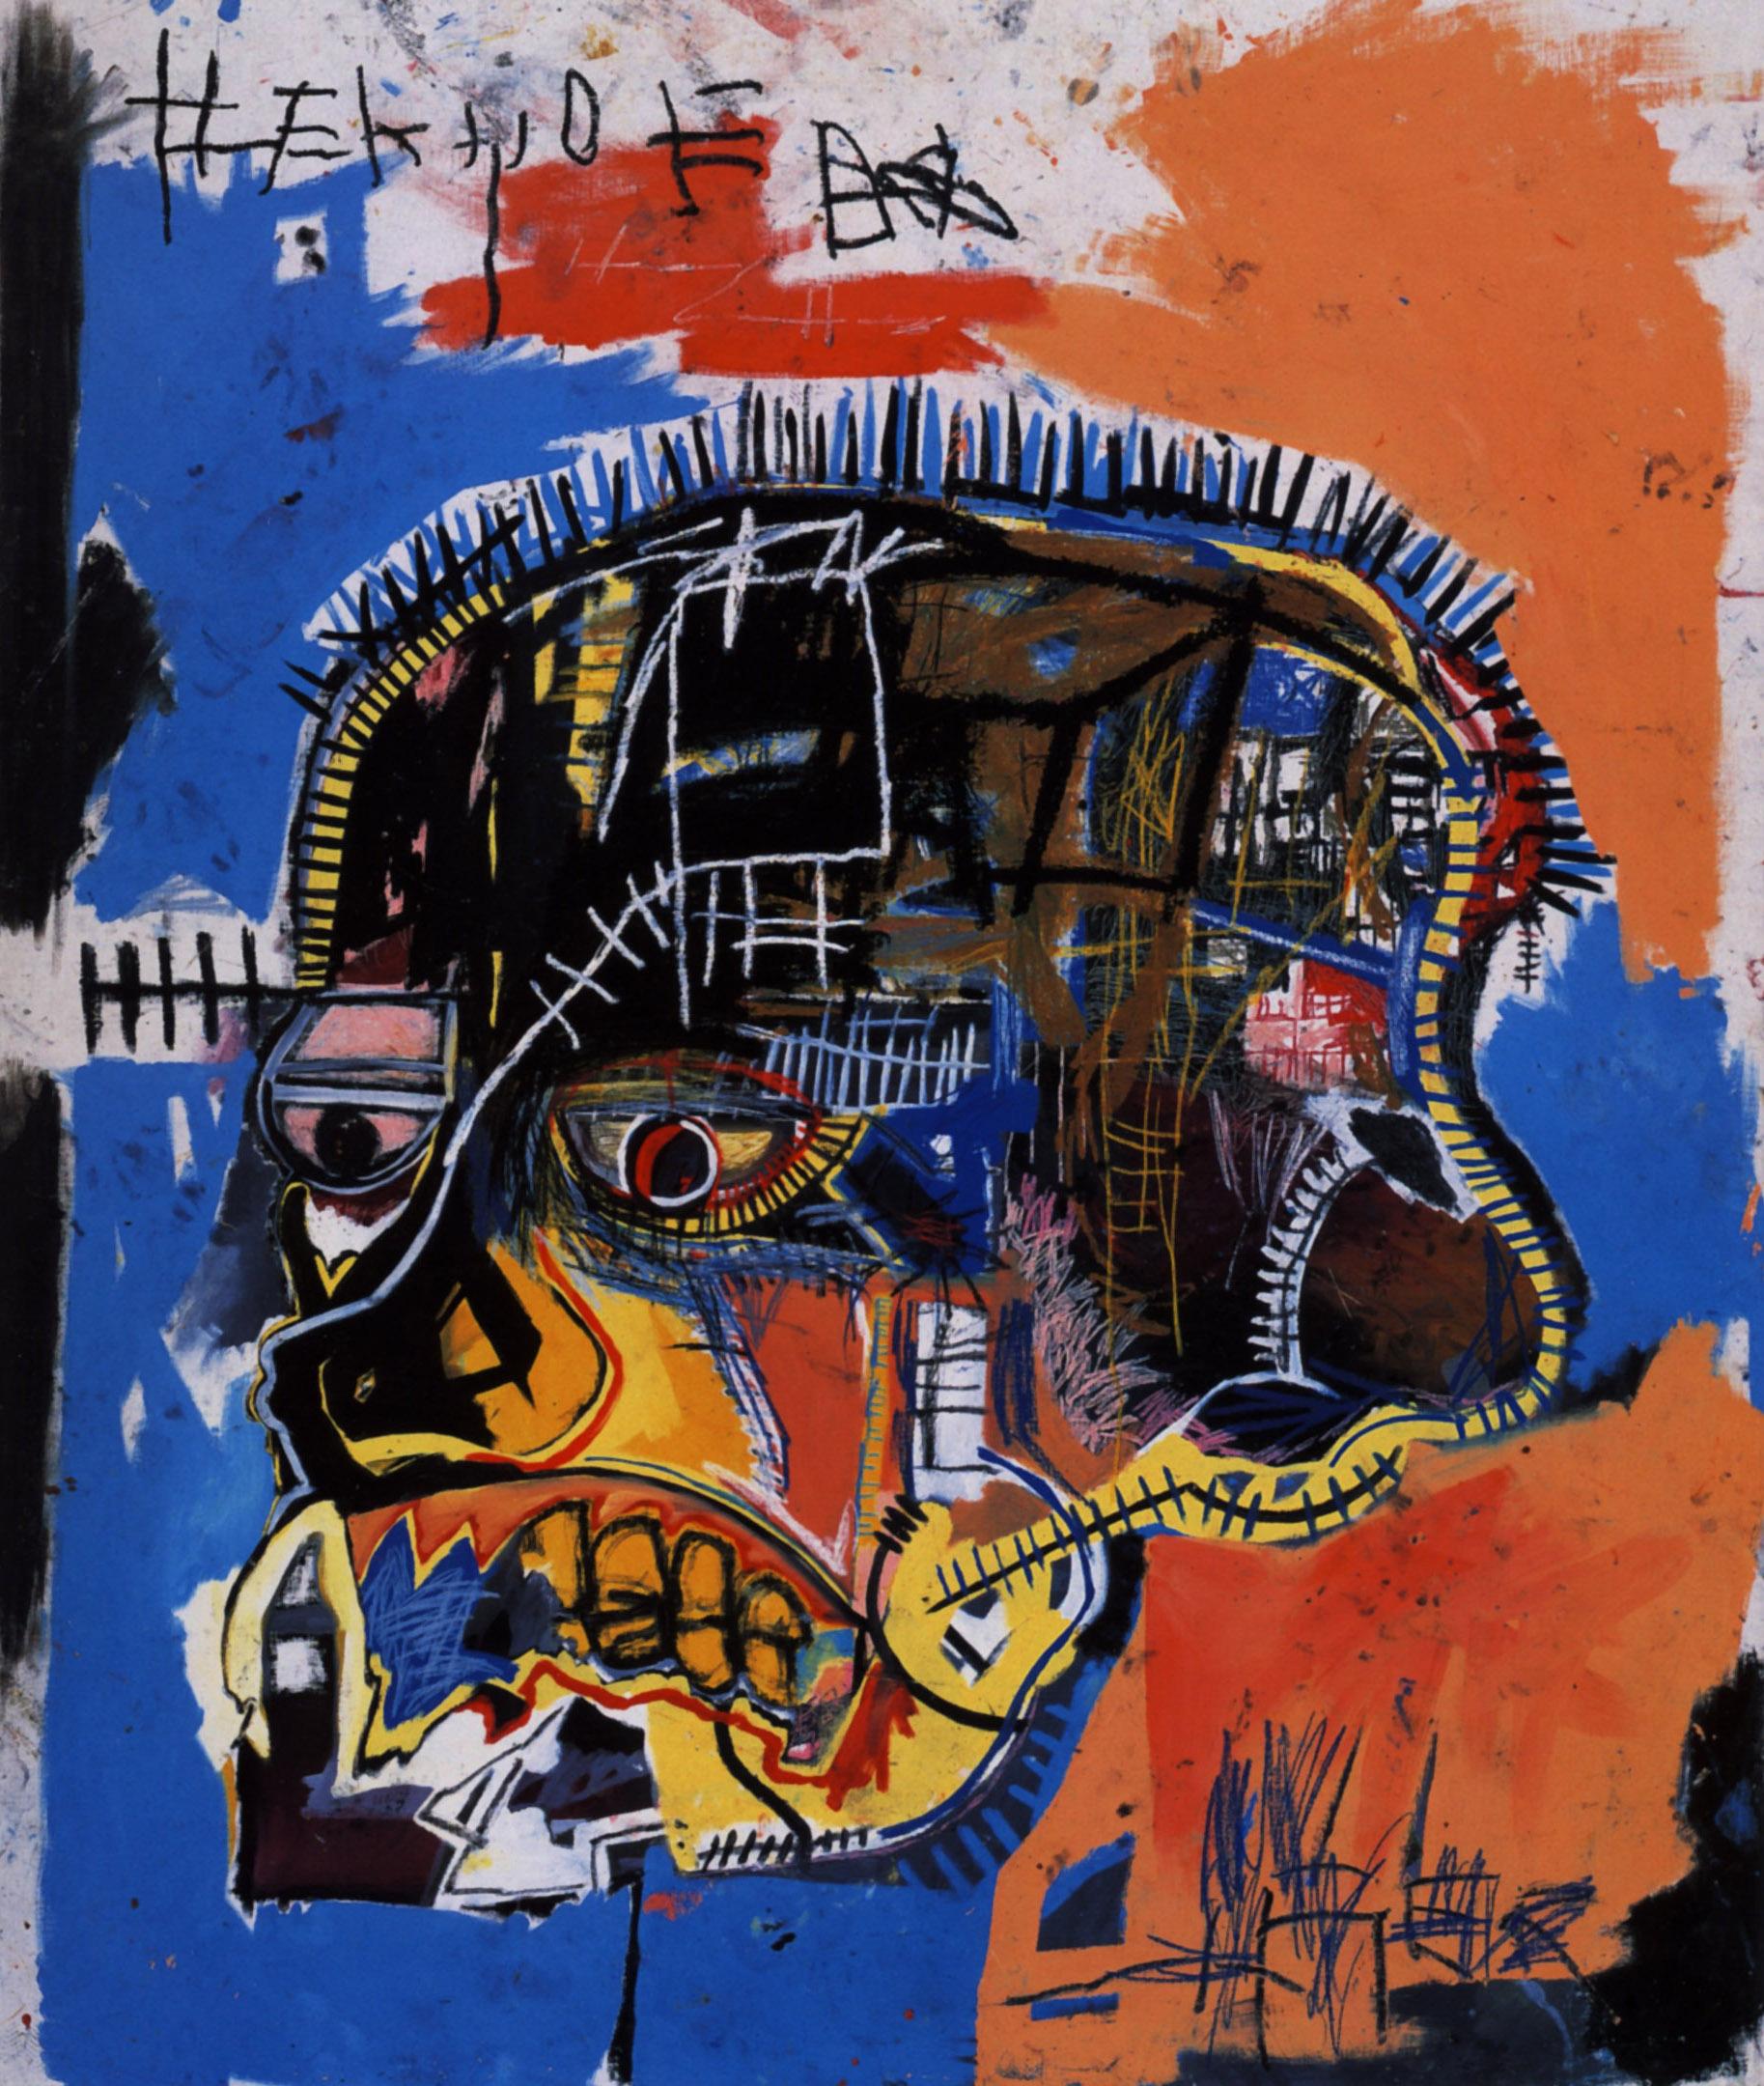 "Jean-Michel Basquiat. ""Scull"" (1981). Acrylic,crayon,canvas.175.9 x 207 cm. Courtesy the Broad, Los Angeles."